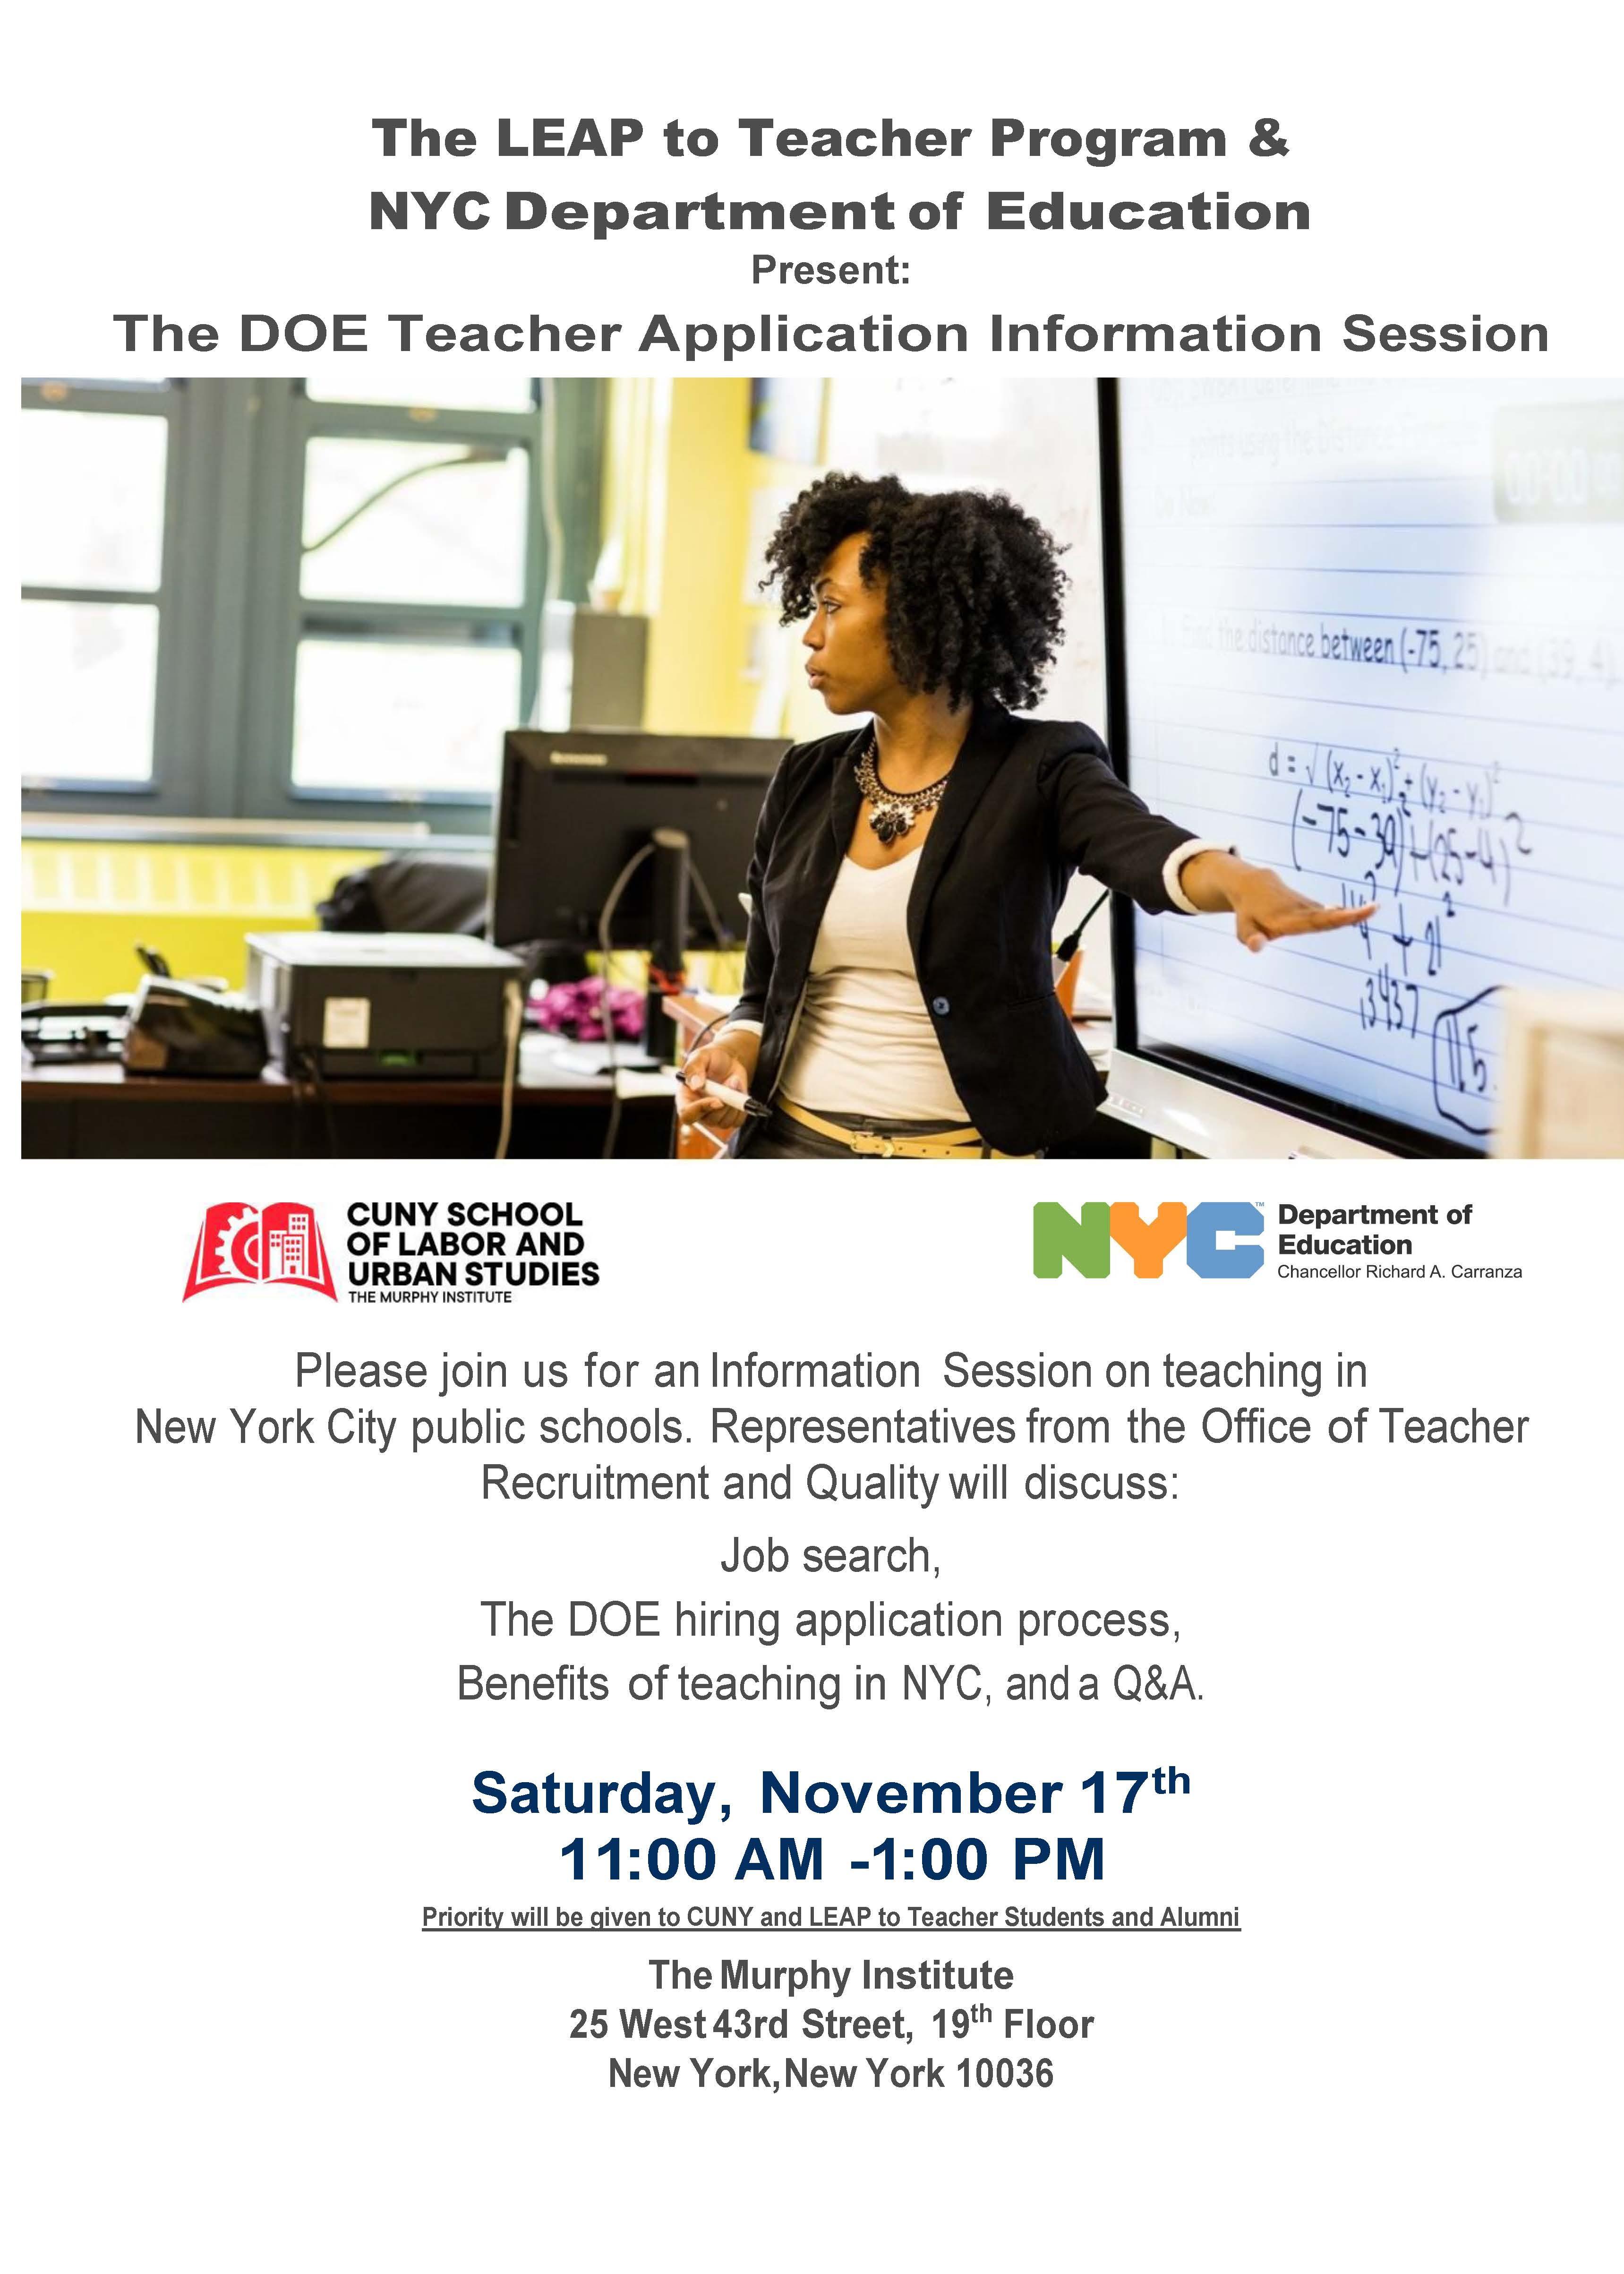 DOE Teacher Application Information Session - 17 NOV 2018